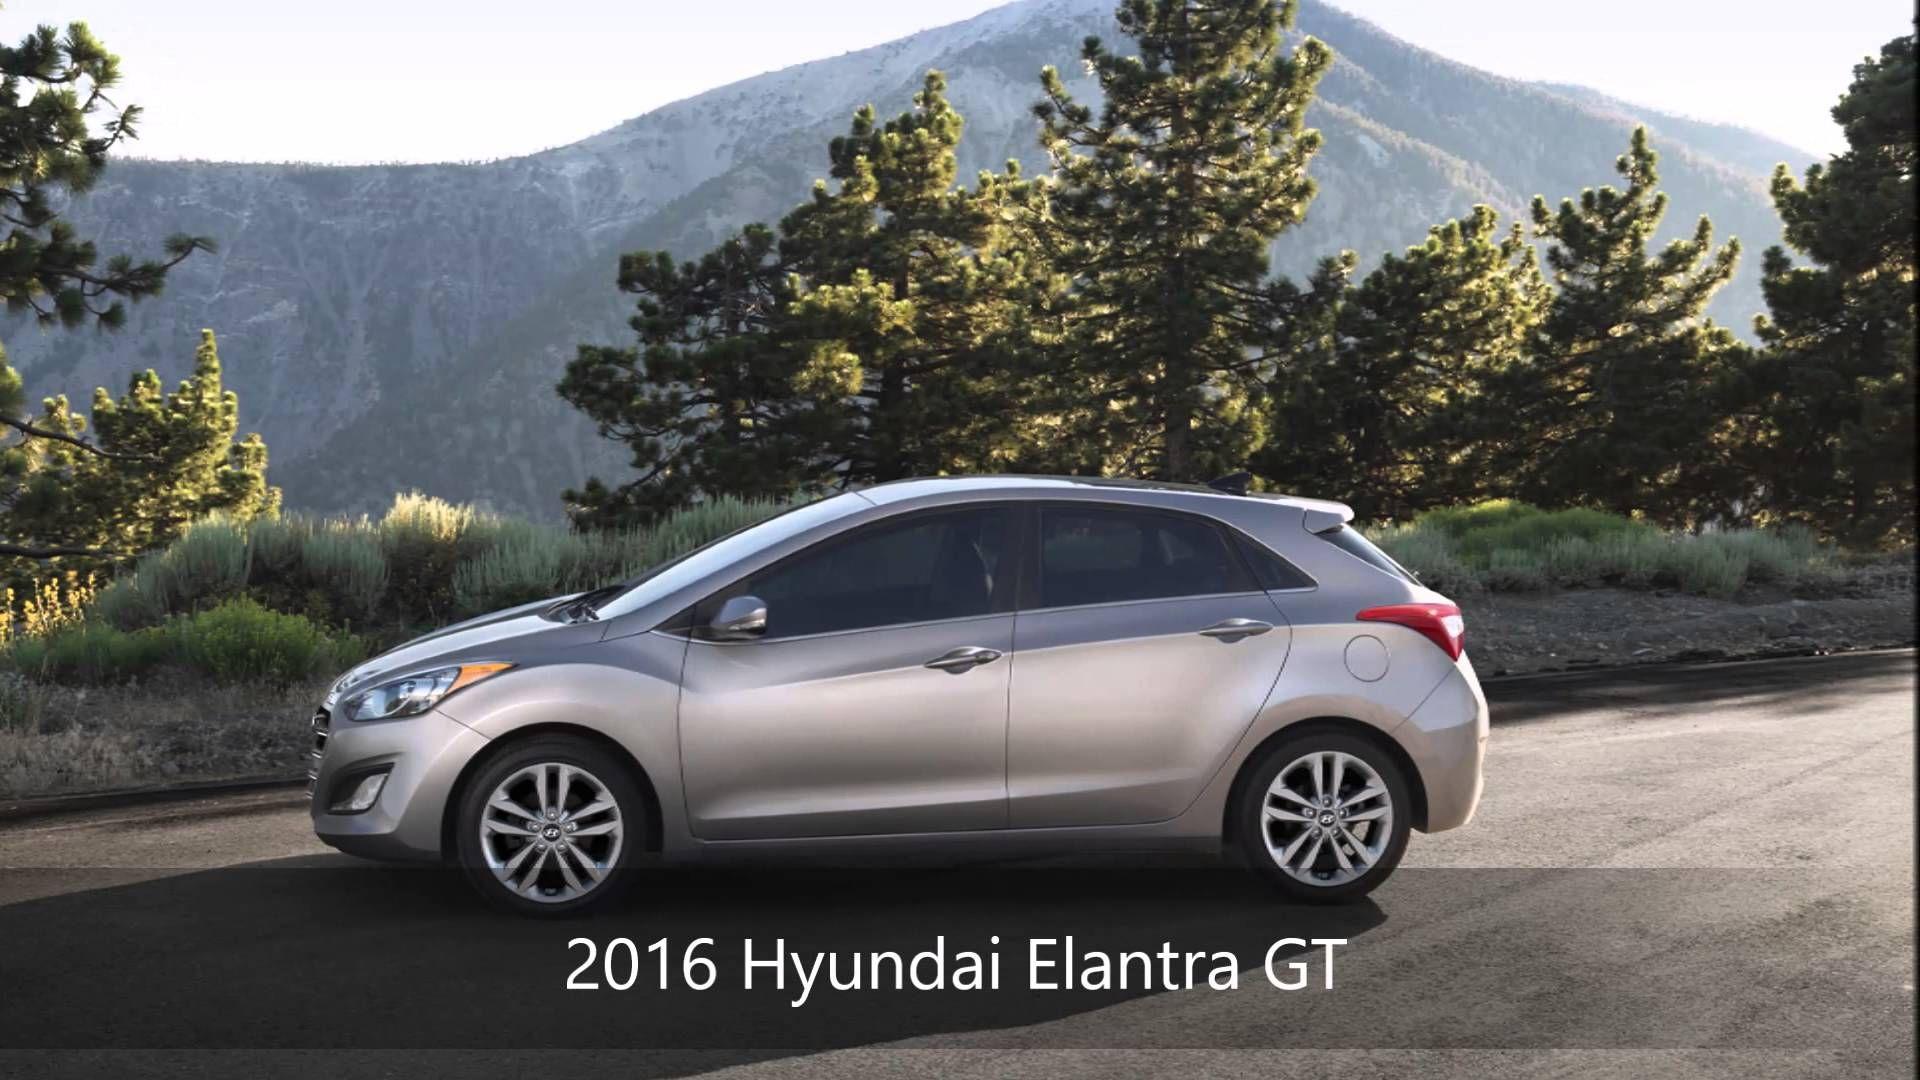 2016 Hyundai Elantra GT at Sterling Hyundai in Lafayette